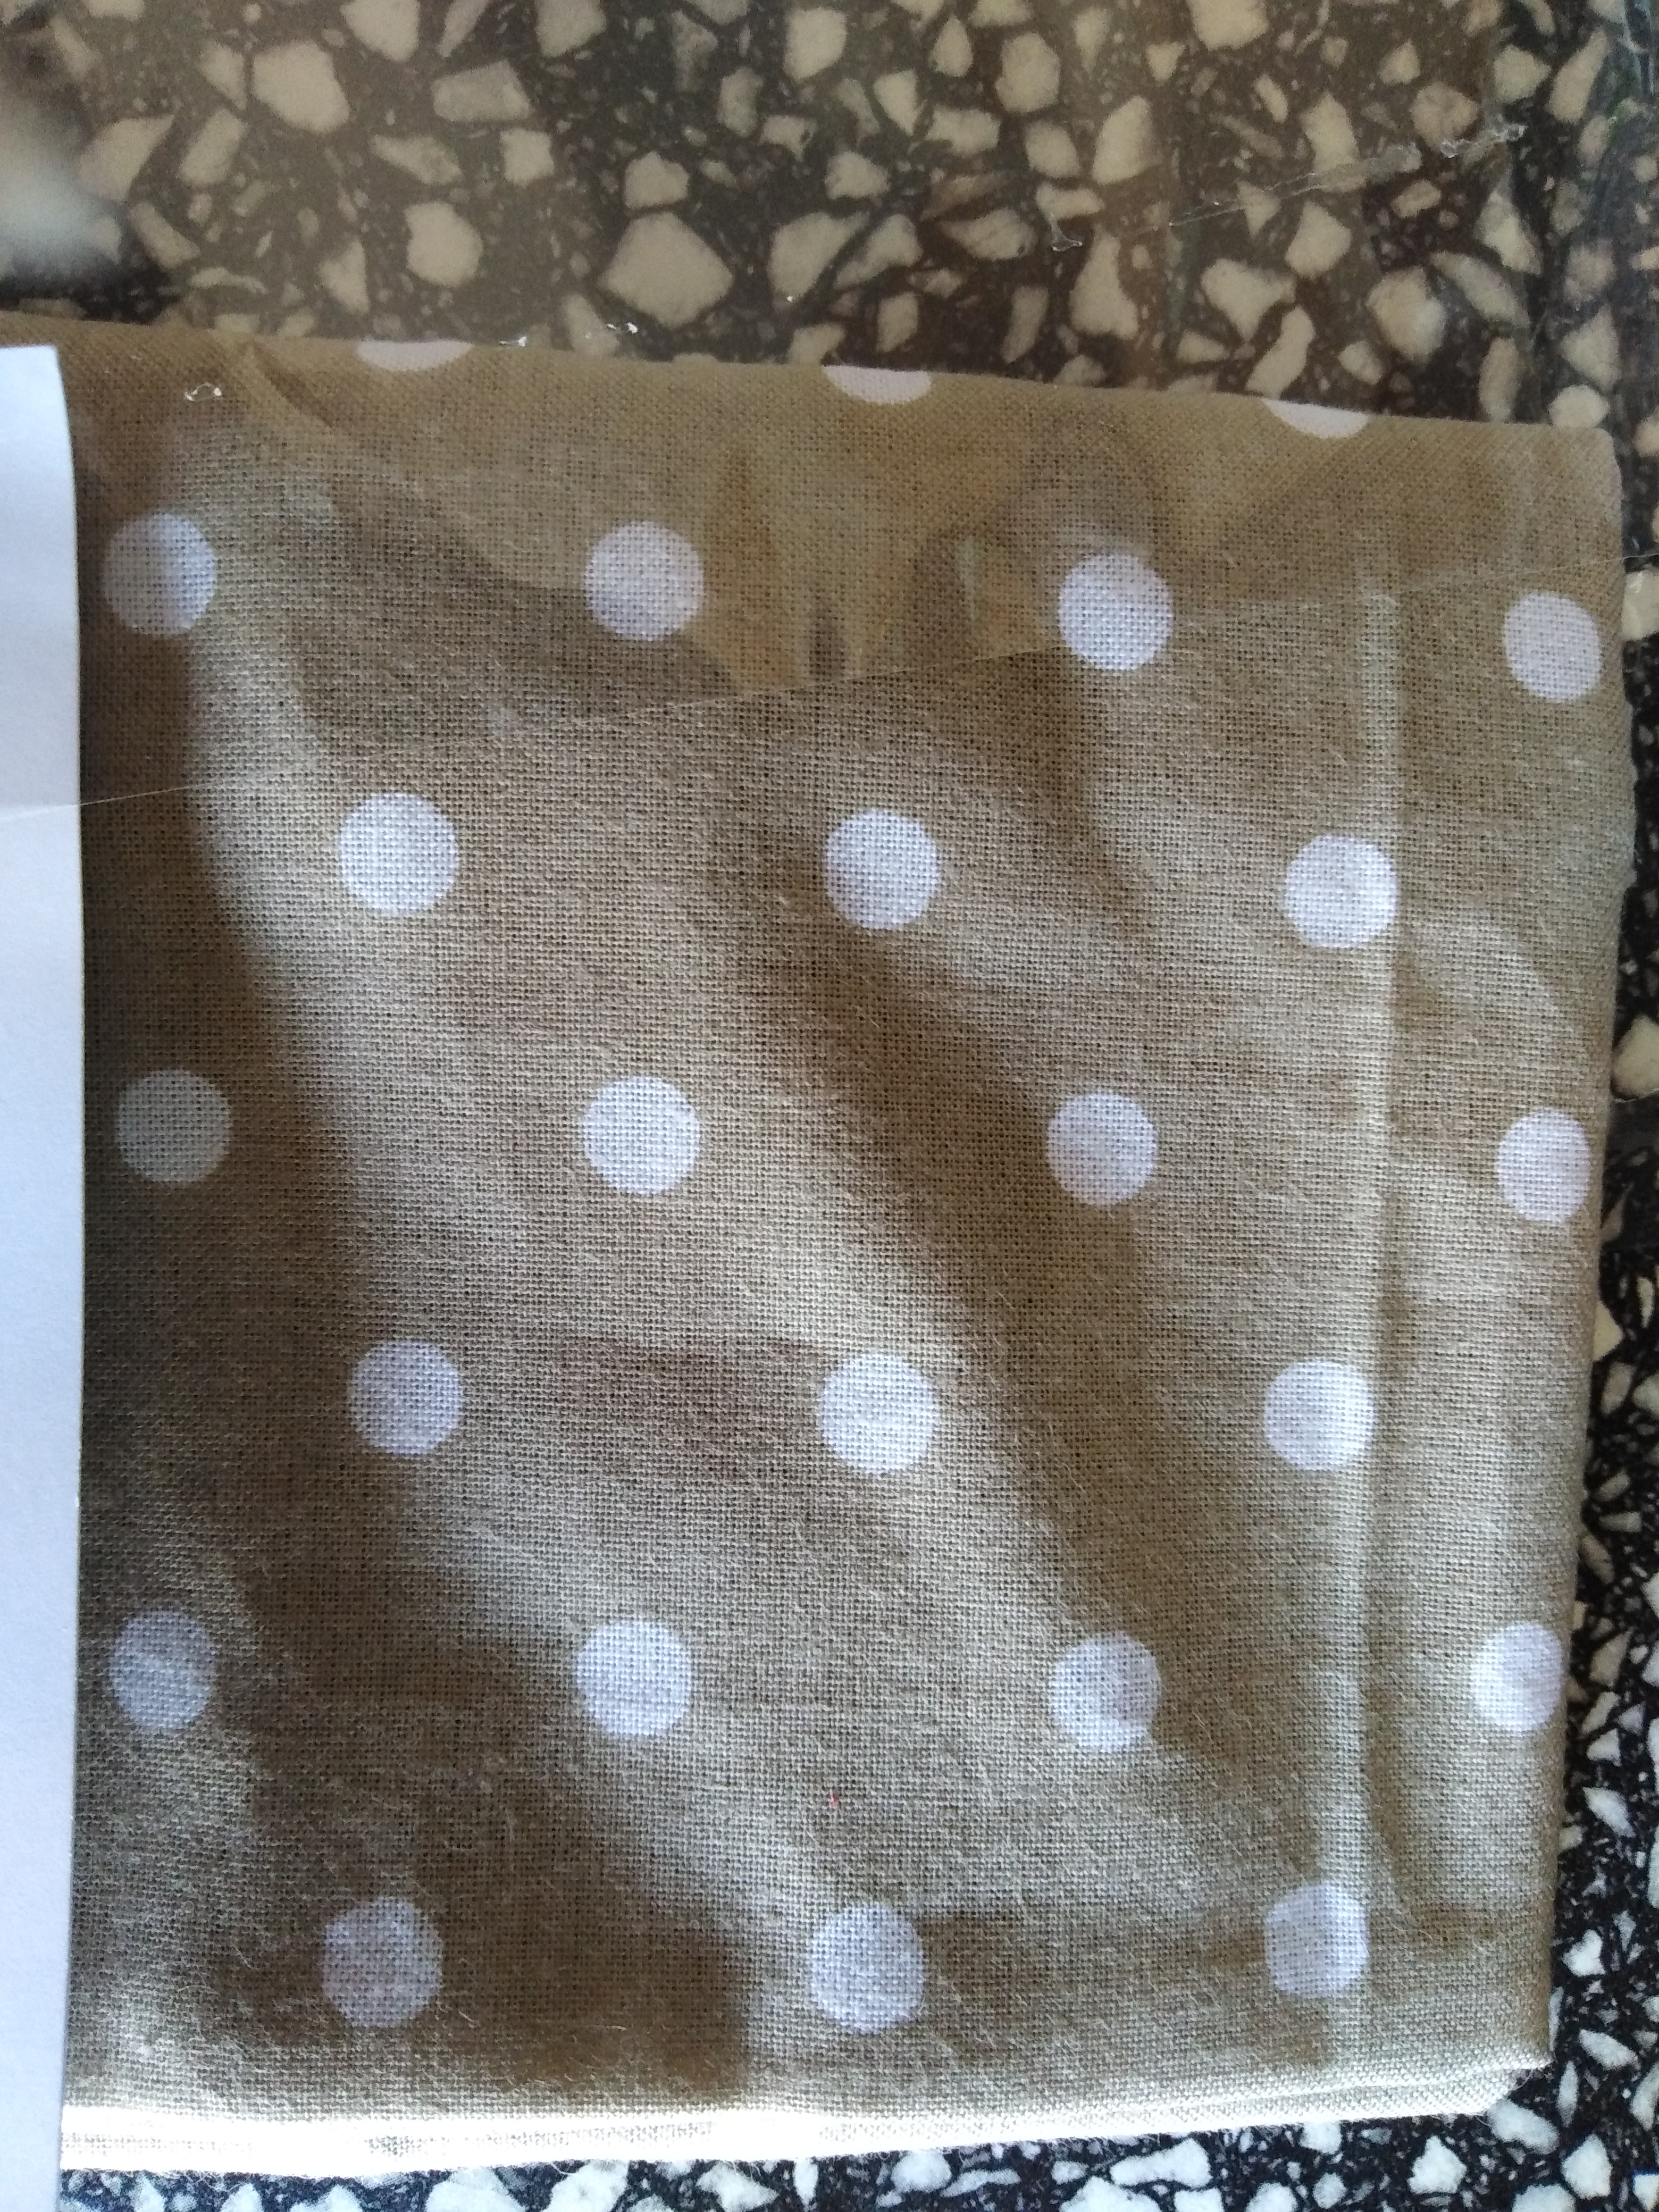 Bavlněný šátek 65 x 65 cm, béžovo bílý puntík 5 mm